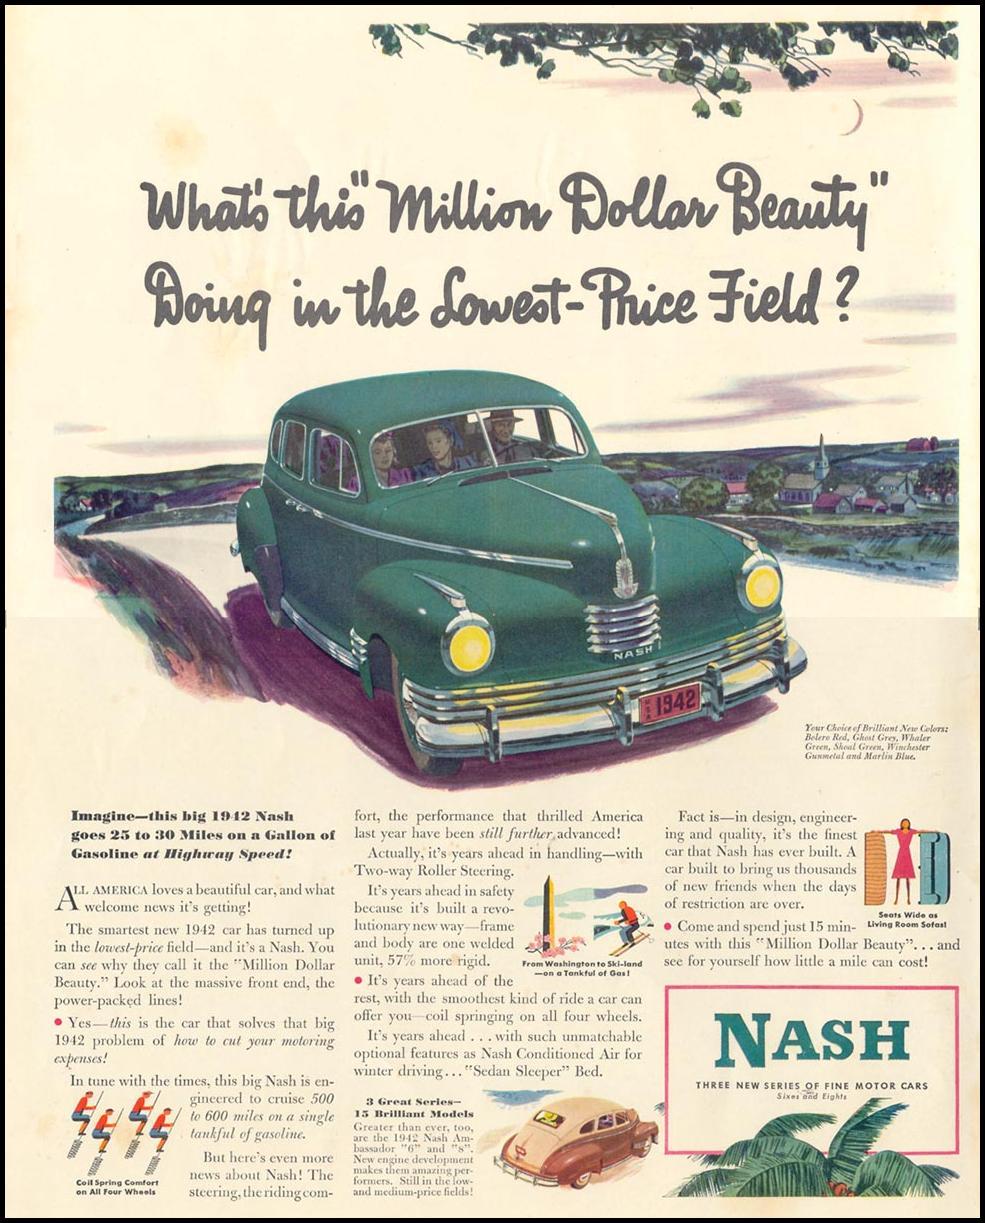 NASH AUTOMOBILES LIFE 10/13/1941 INSIDE FRONT